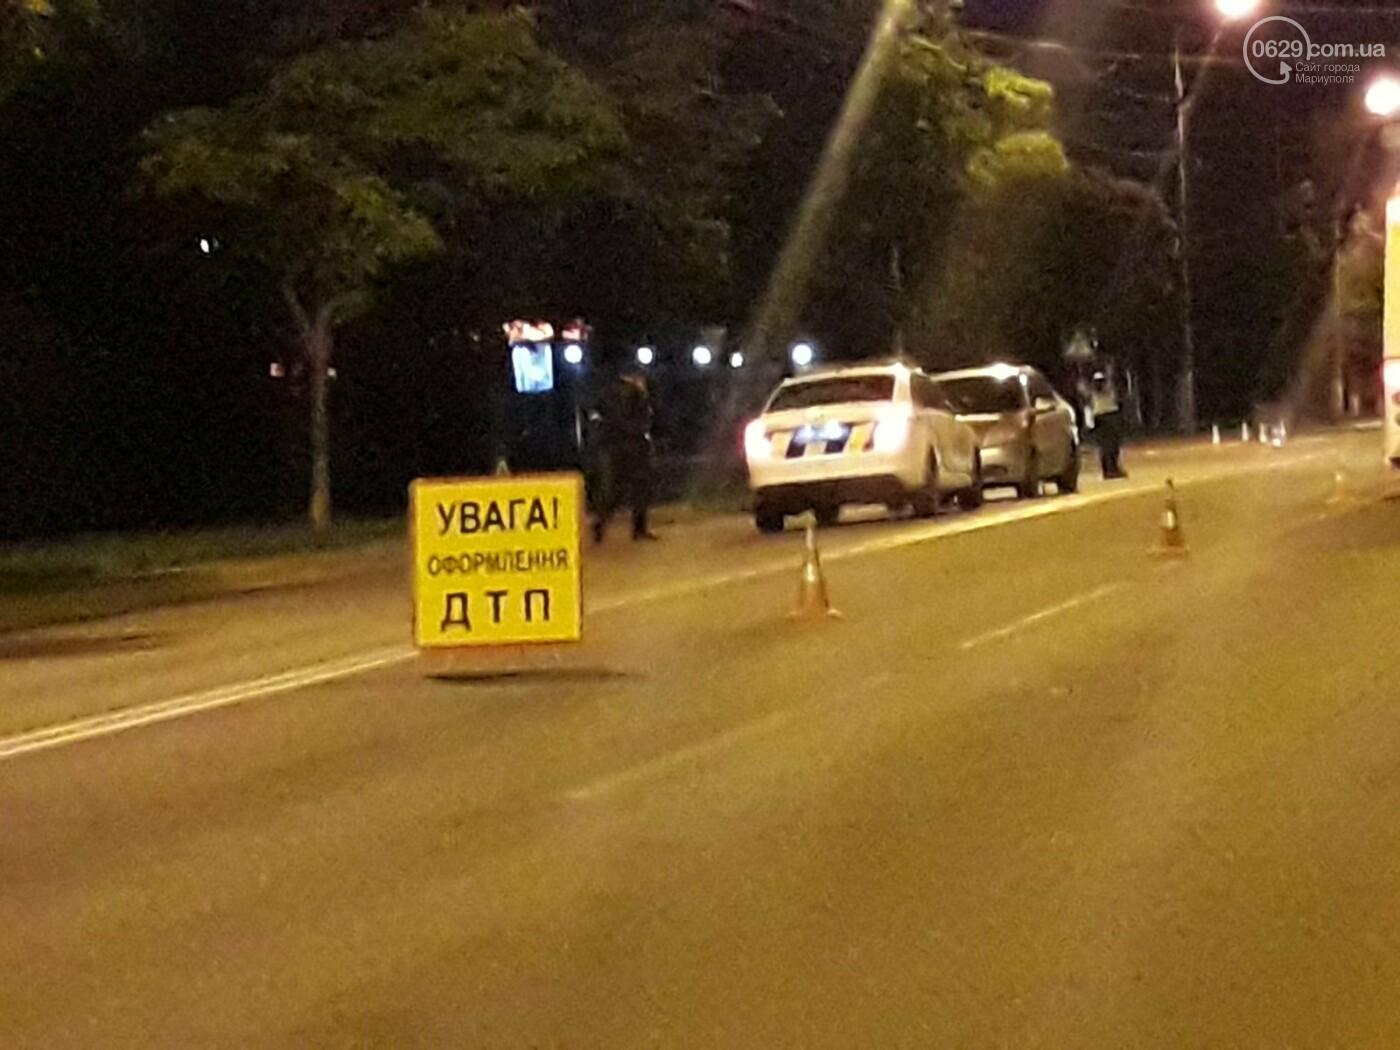 В центре Мариуполя на «зебре» Chevrolet сбил девушку, - ФОТО, ВИДЕО, фото-5